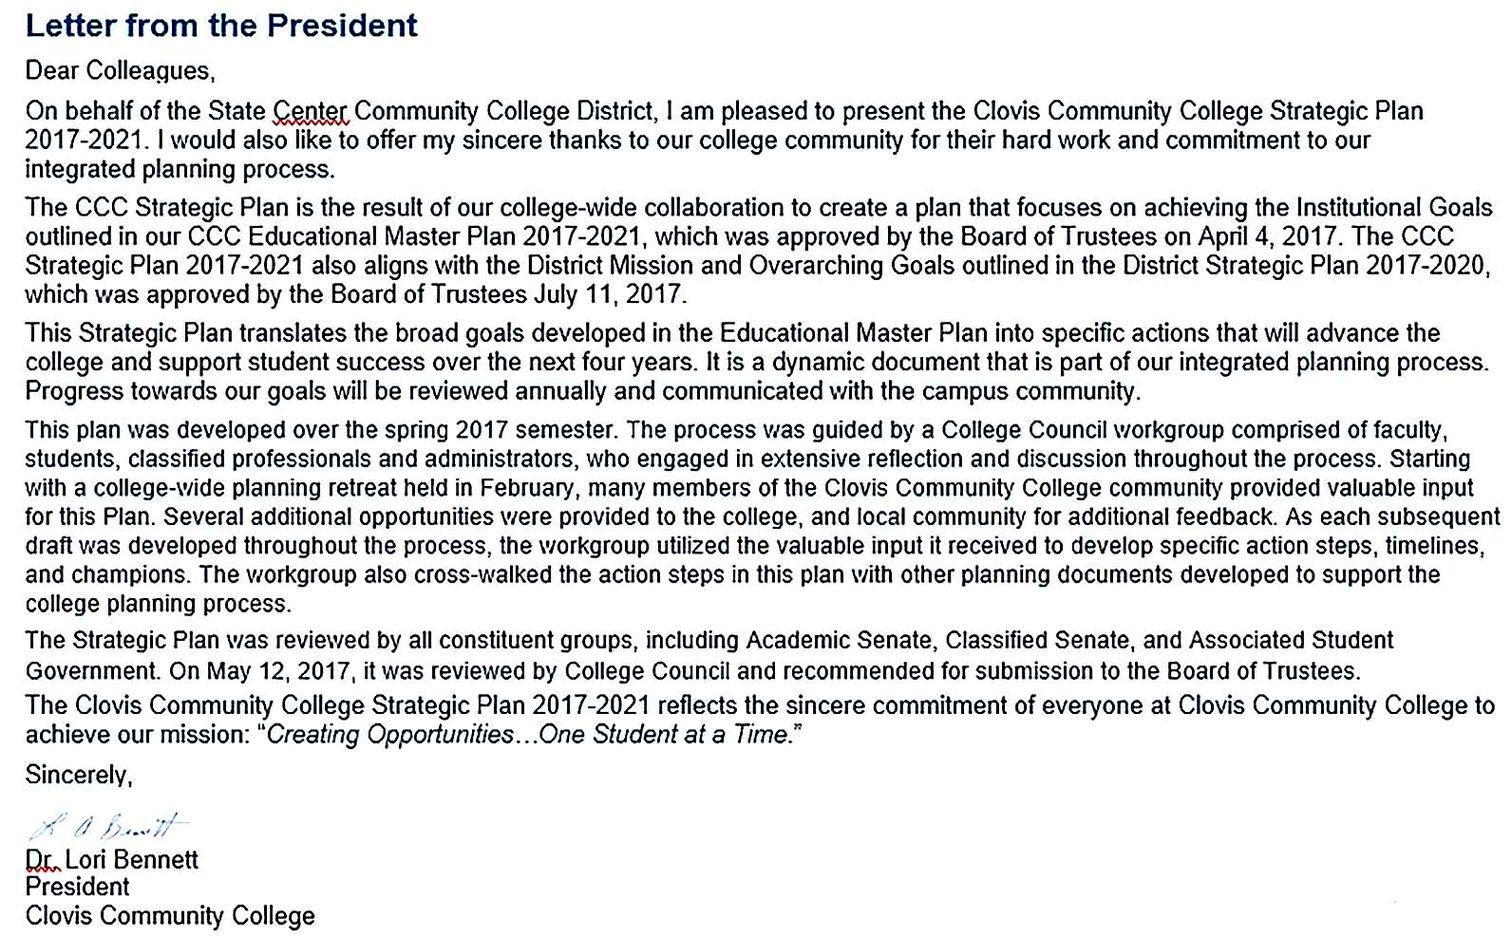 Community College Strategic Plan